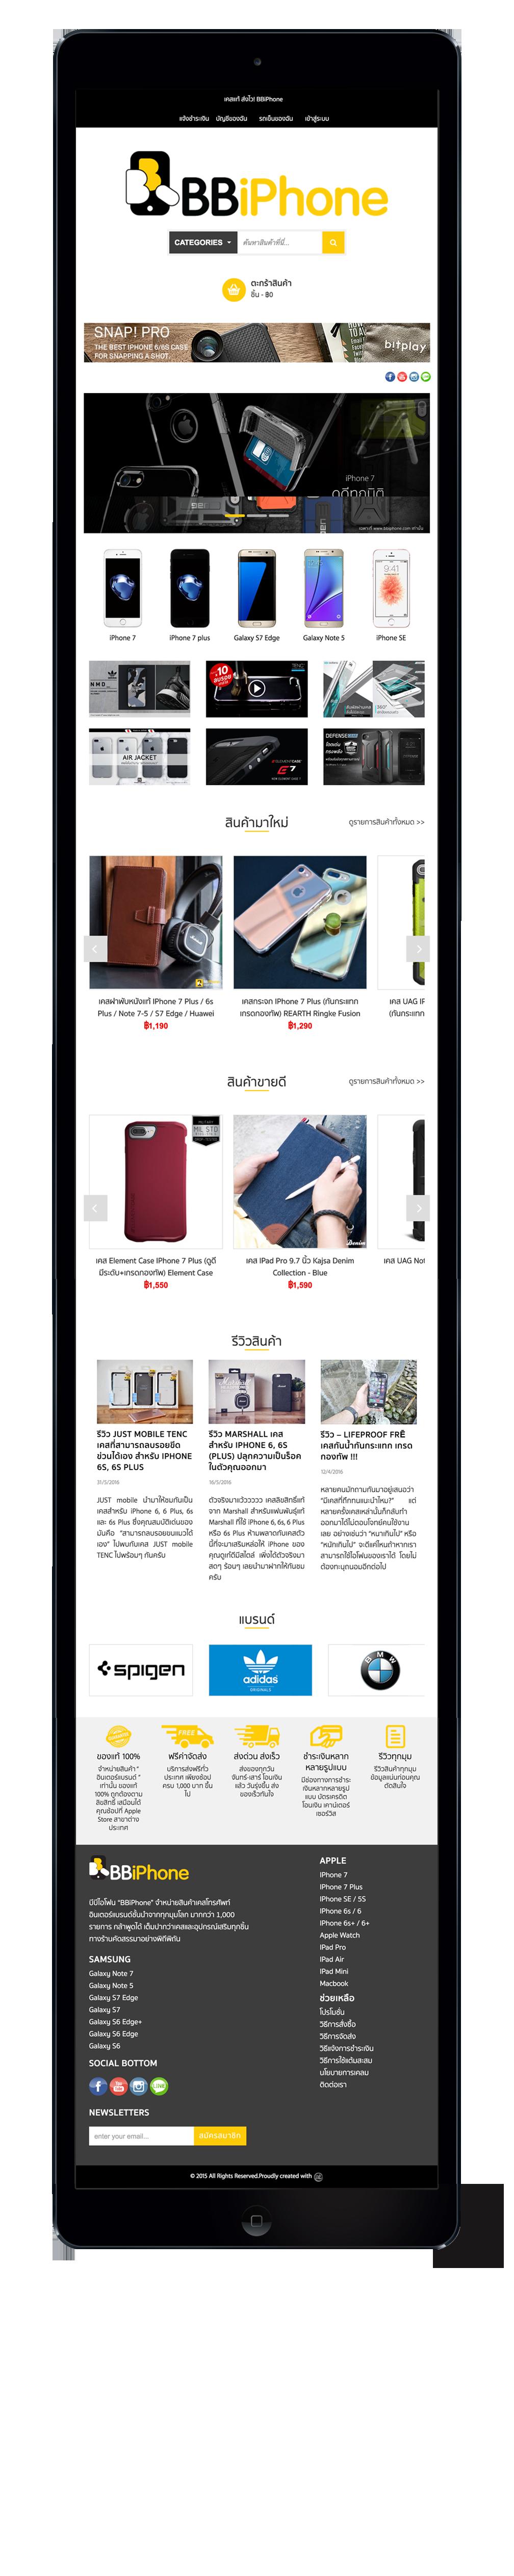 bbiphone_iPad